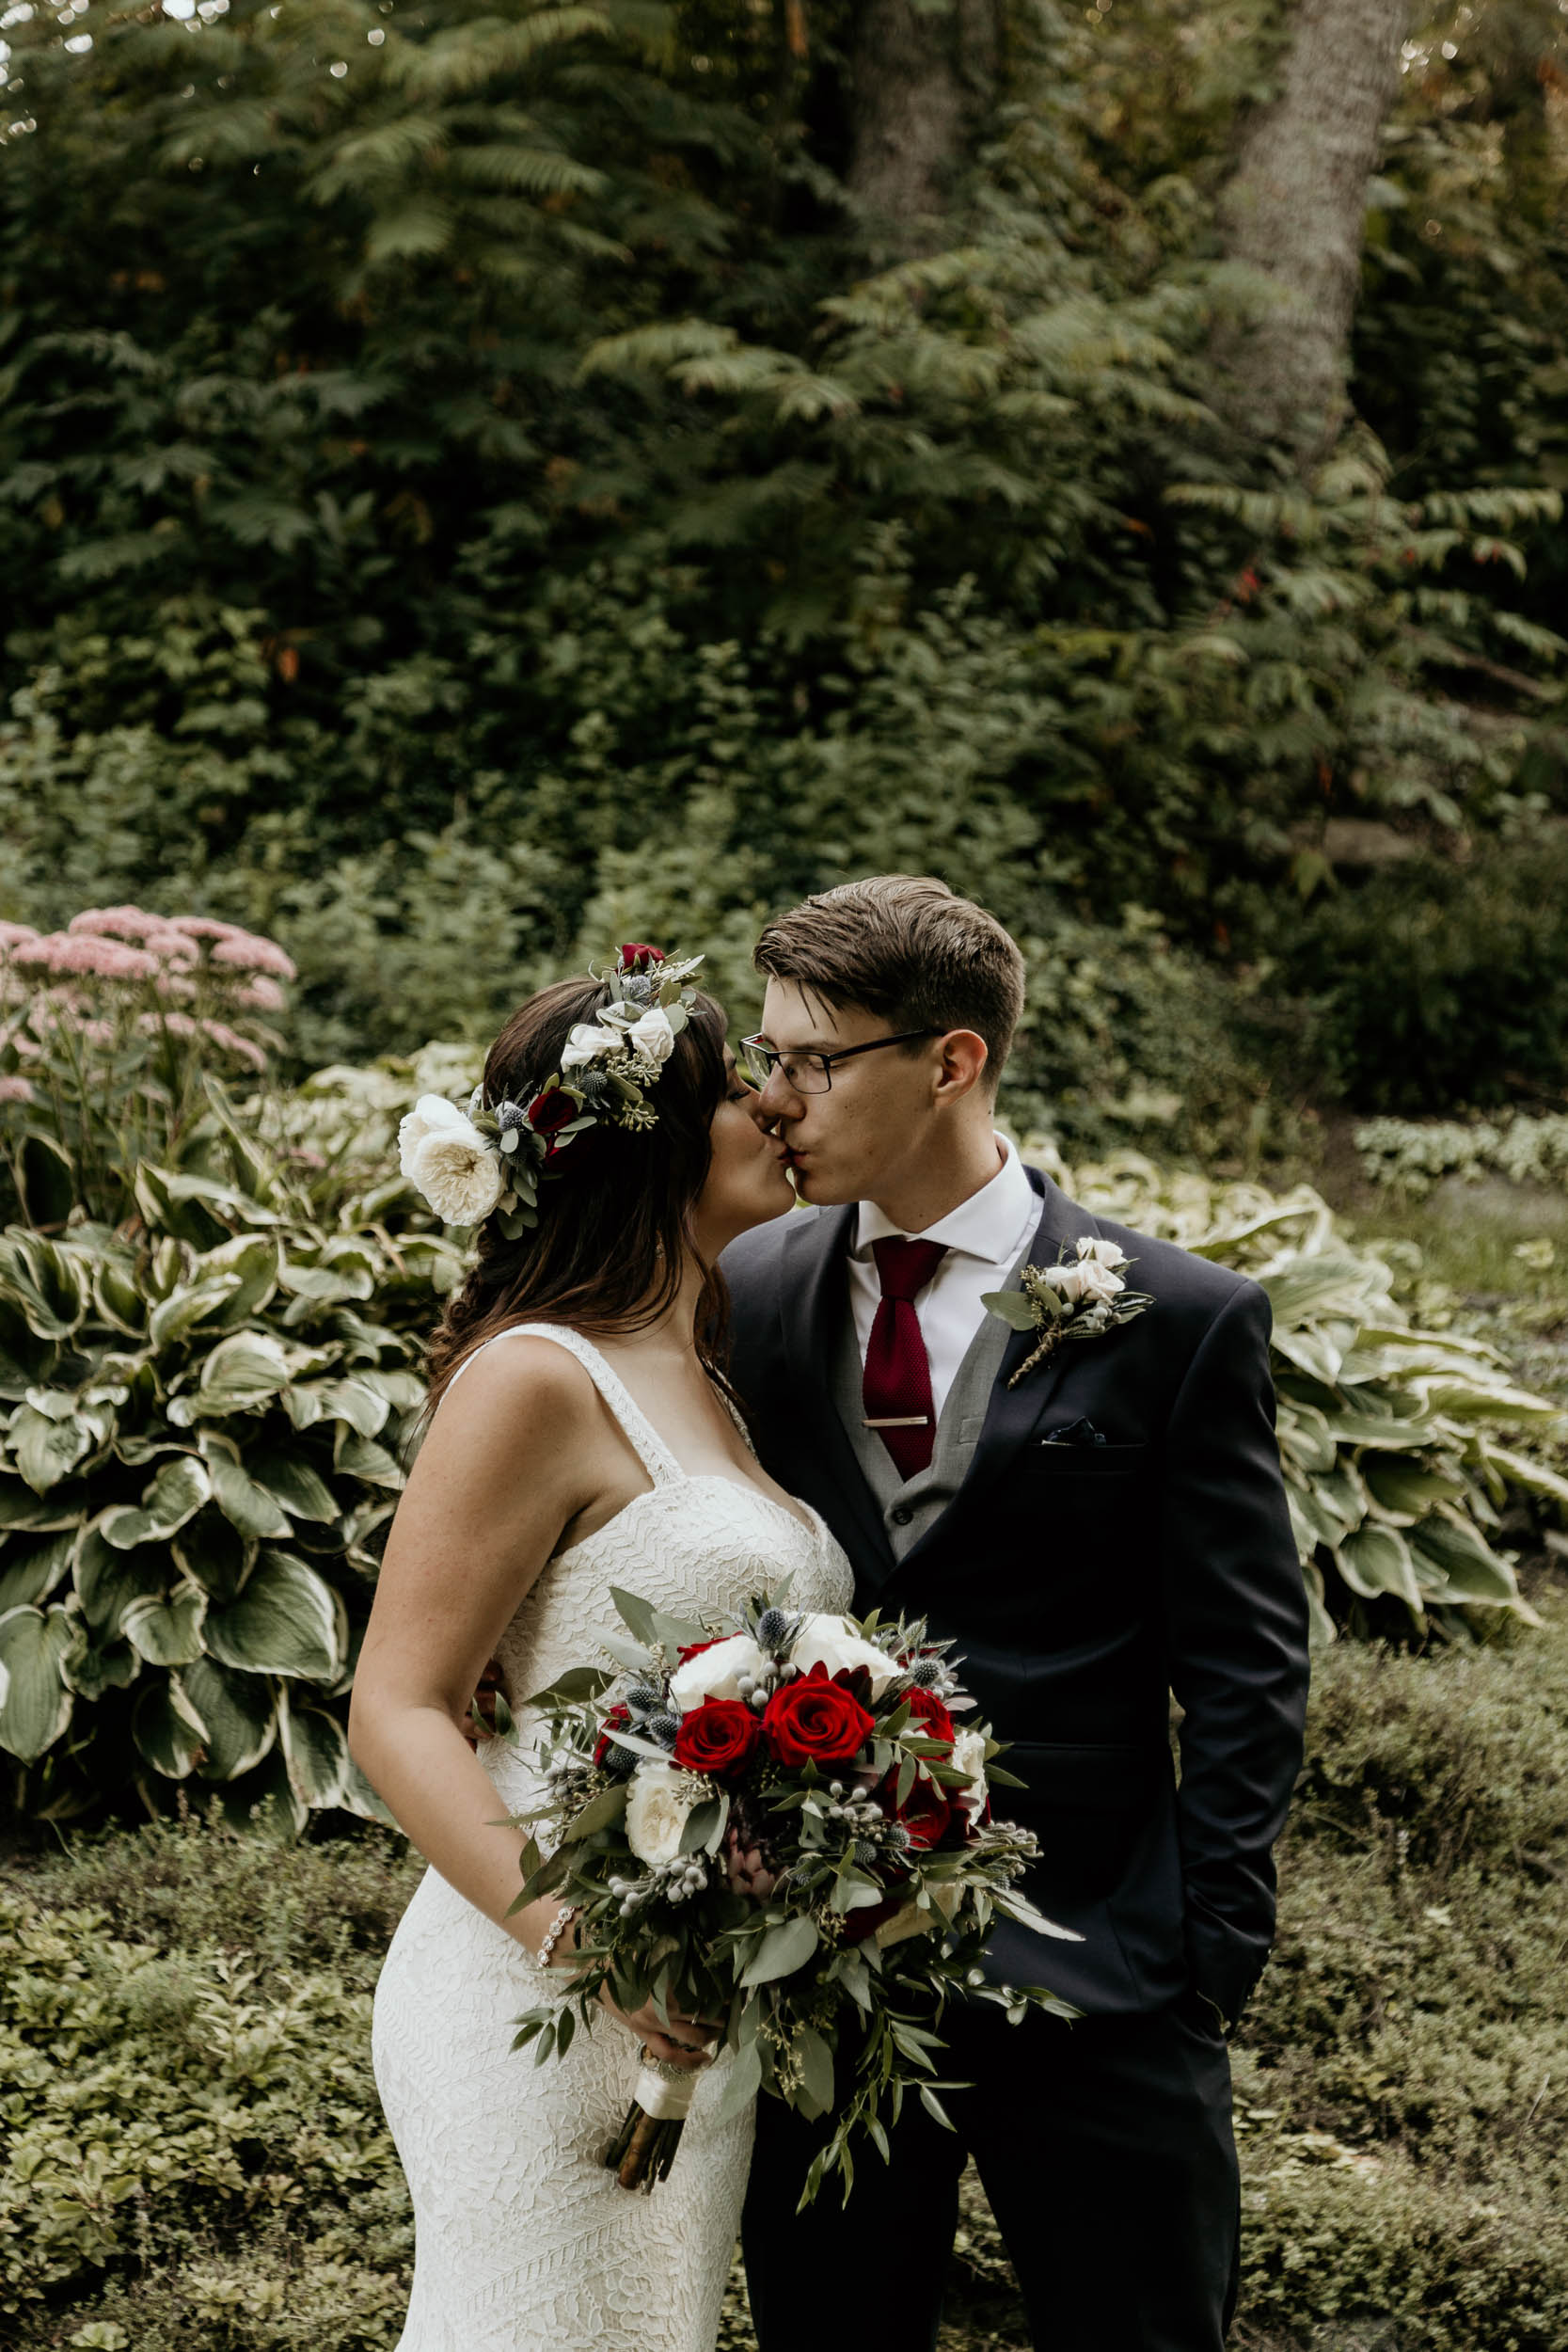 intimate-wedding-elopement-photographer-ottawa-toronto-7699.jpg